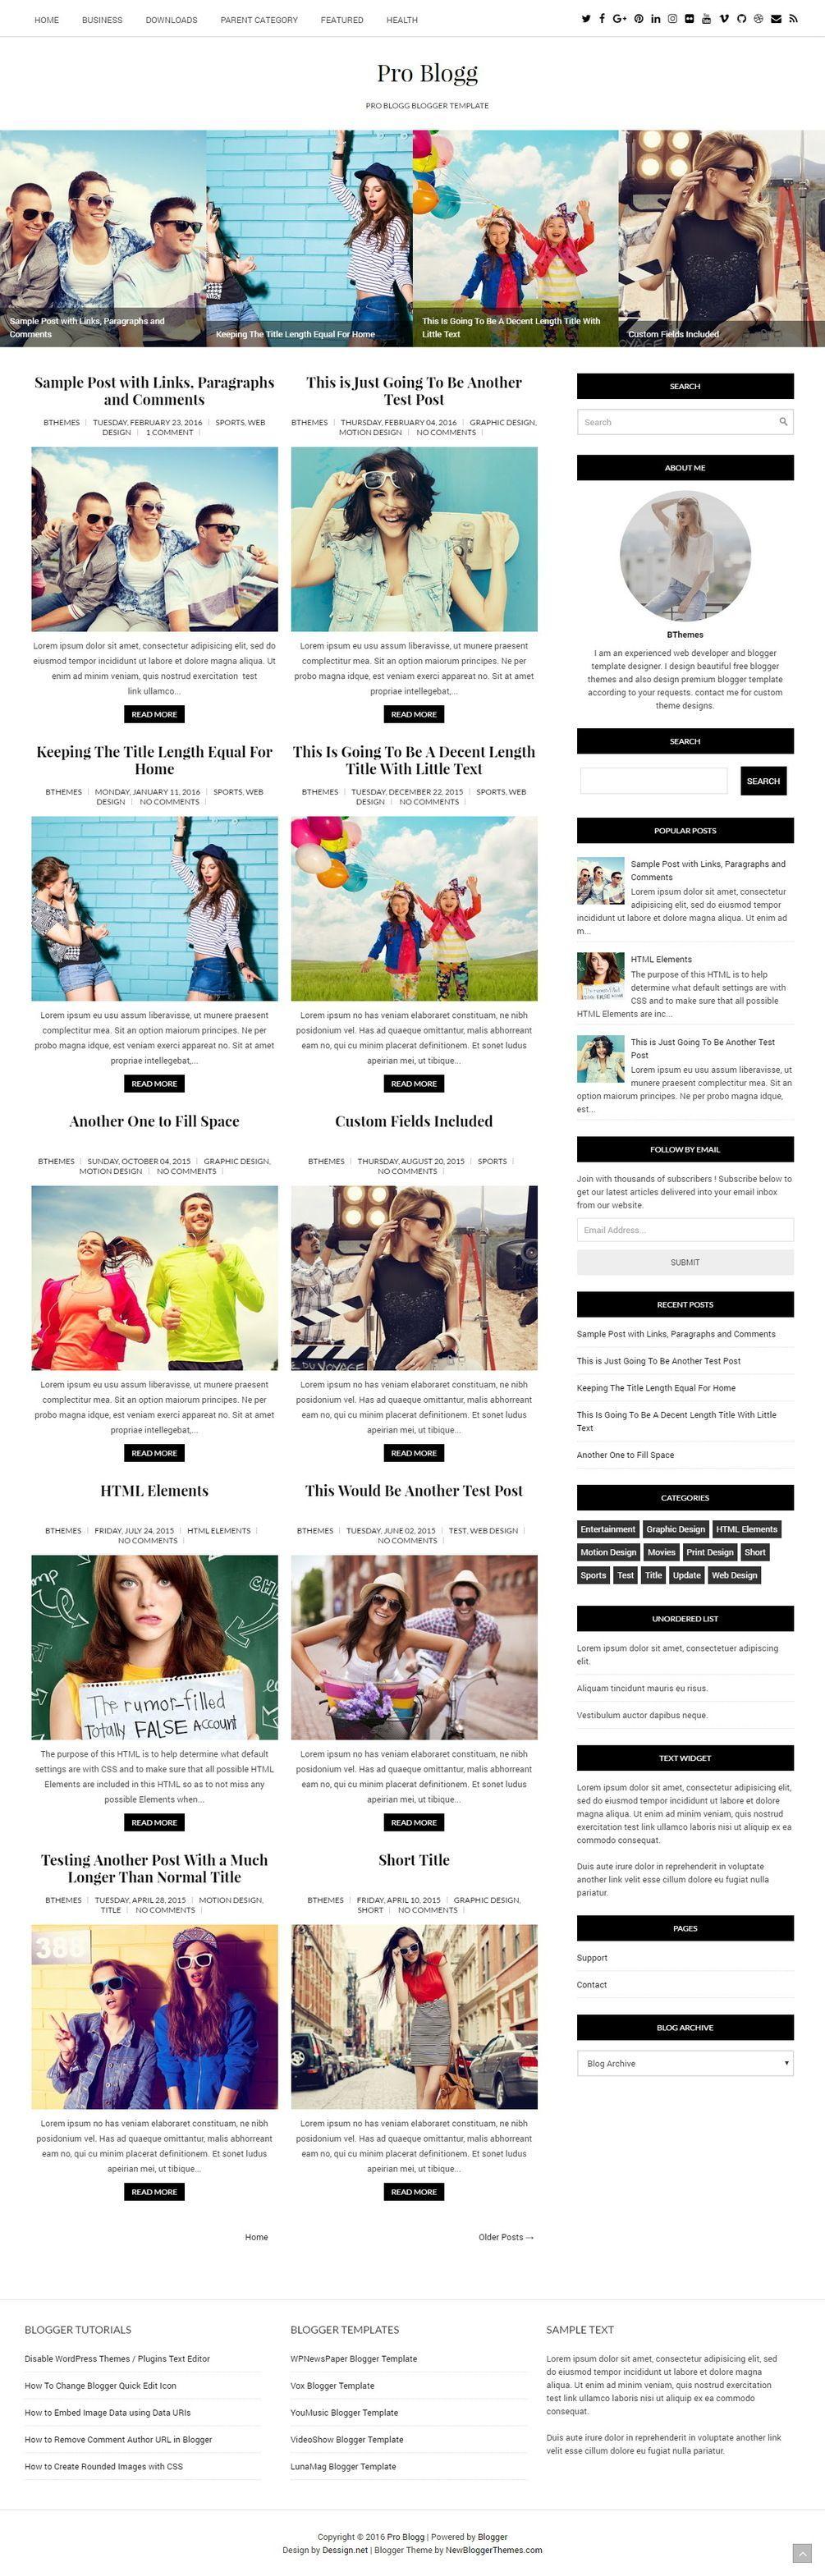 Pro Blogg Blogger Template | Blogger templates, Templates ...